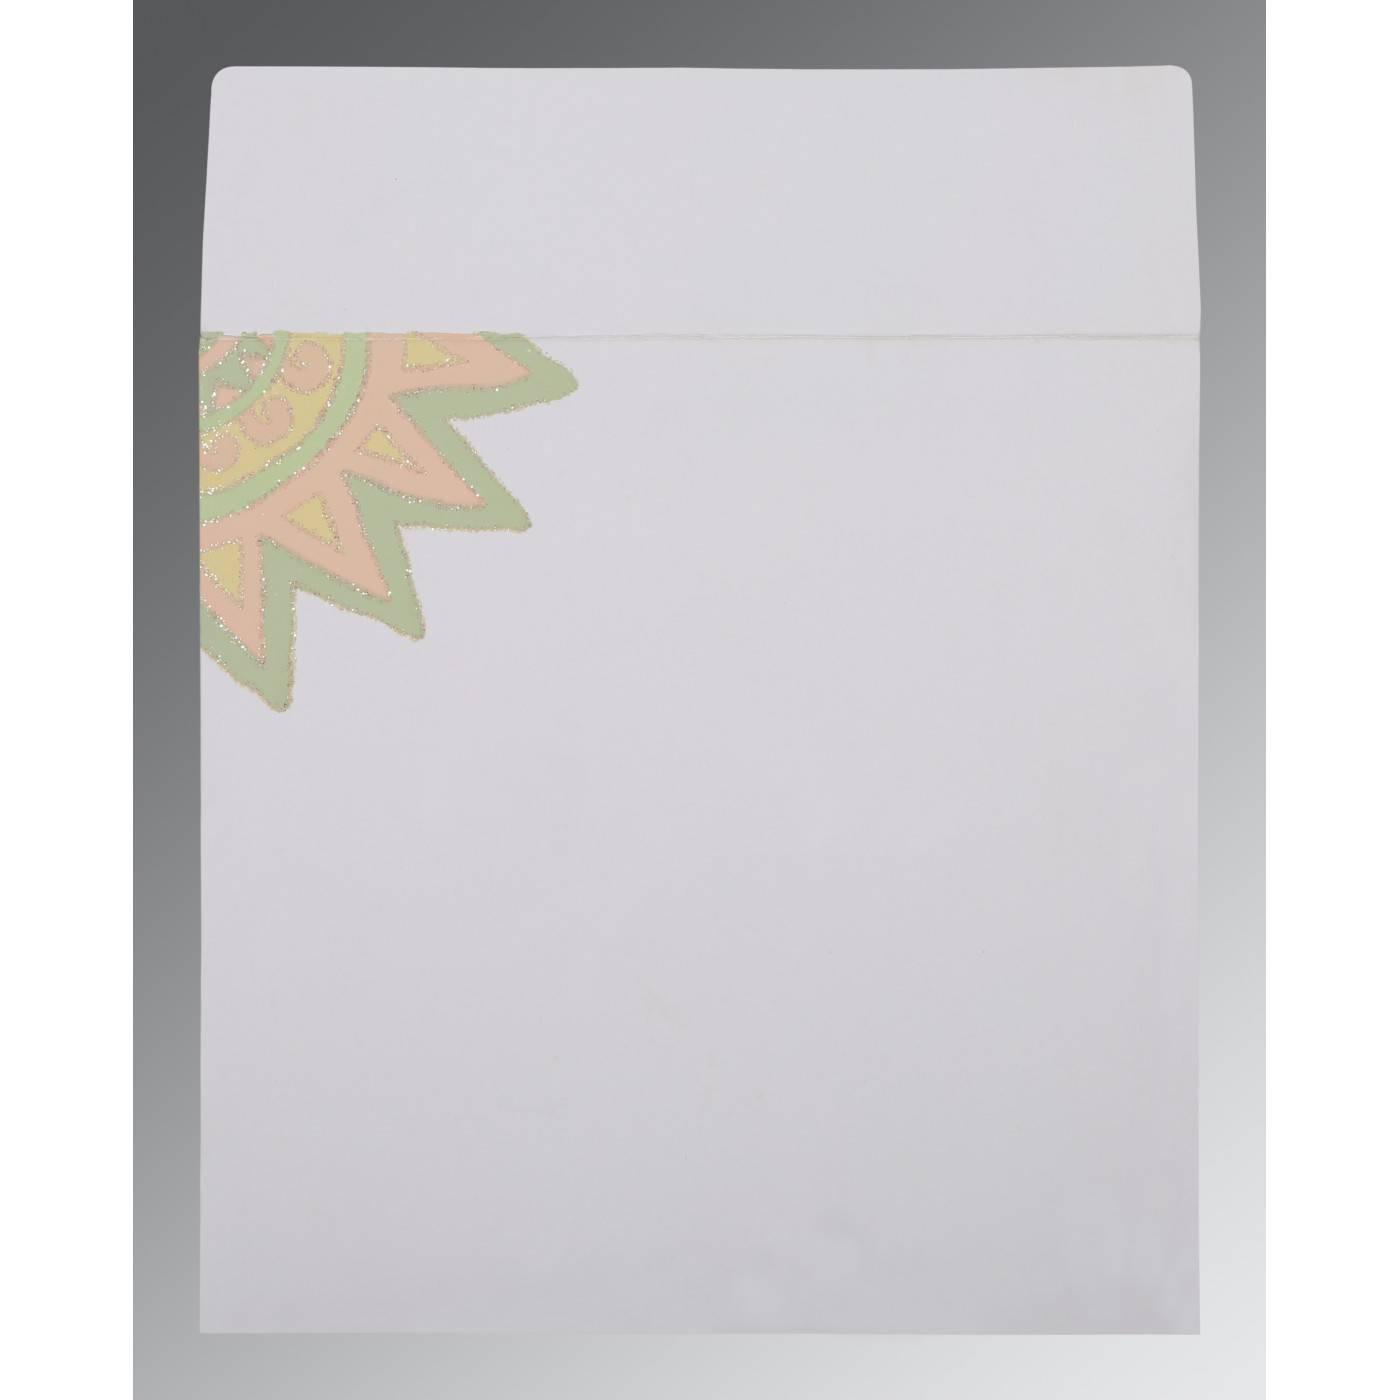 OFF-WHITE MATTE GLITTER WEDDING INVITATION : CRU-1266 - IndianWeddingCards